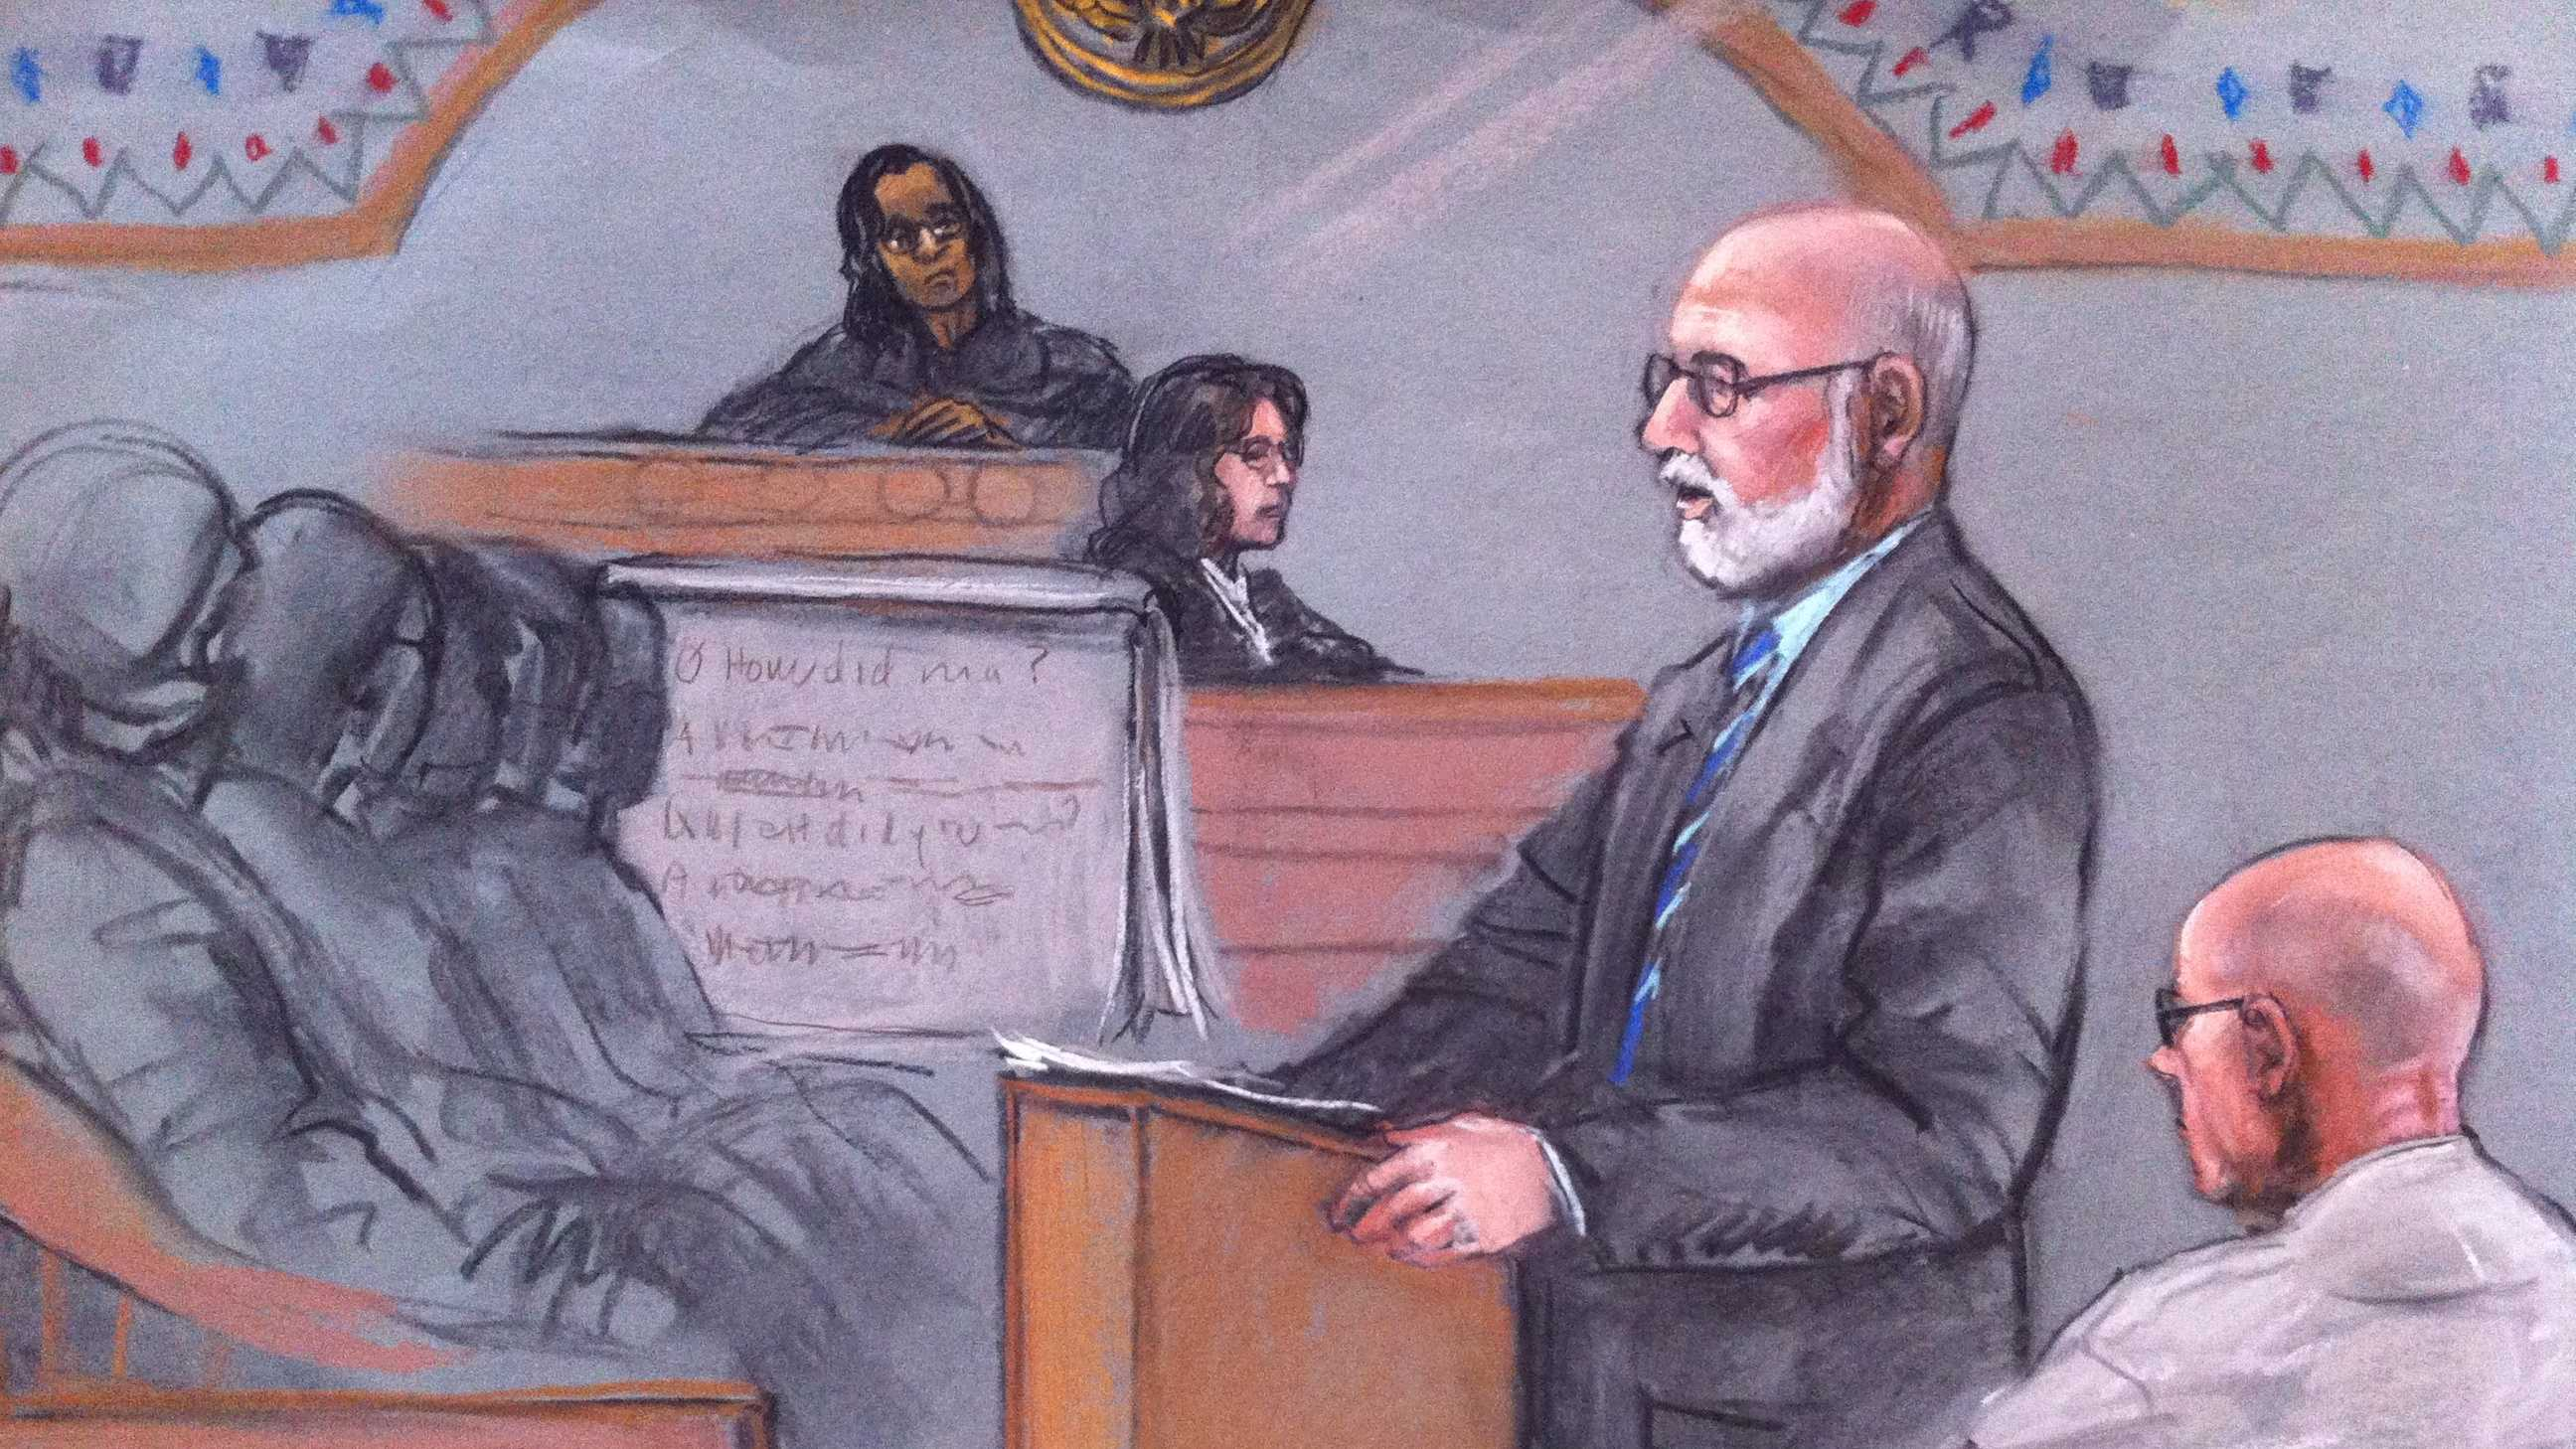 Bulger attorney Carney Sketch